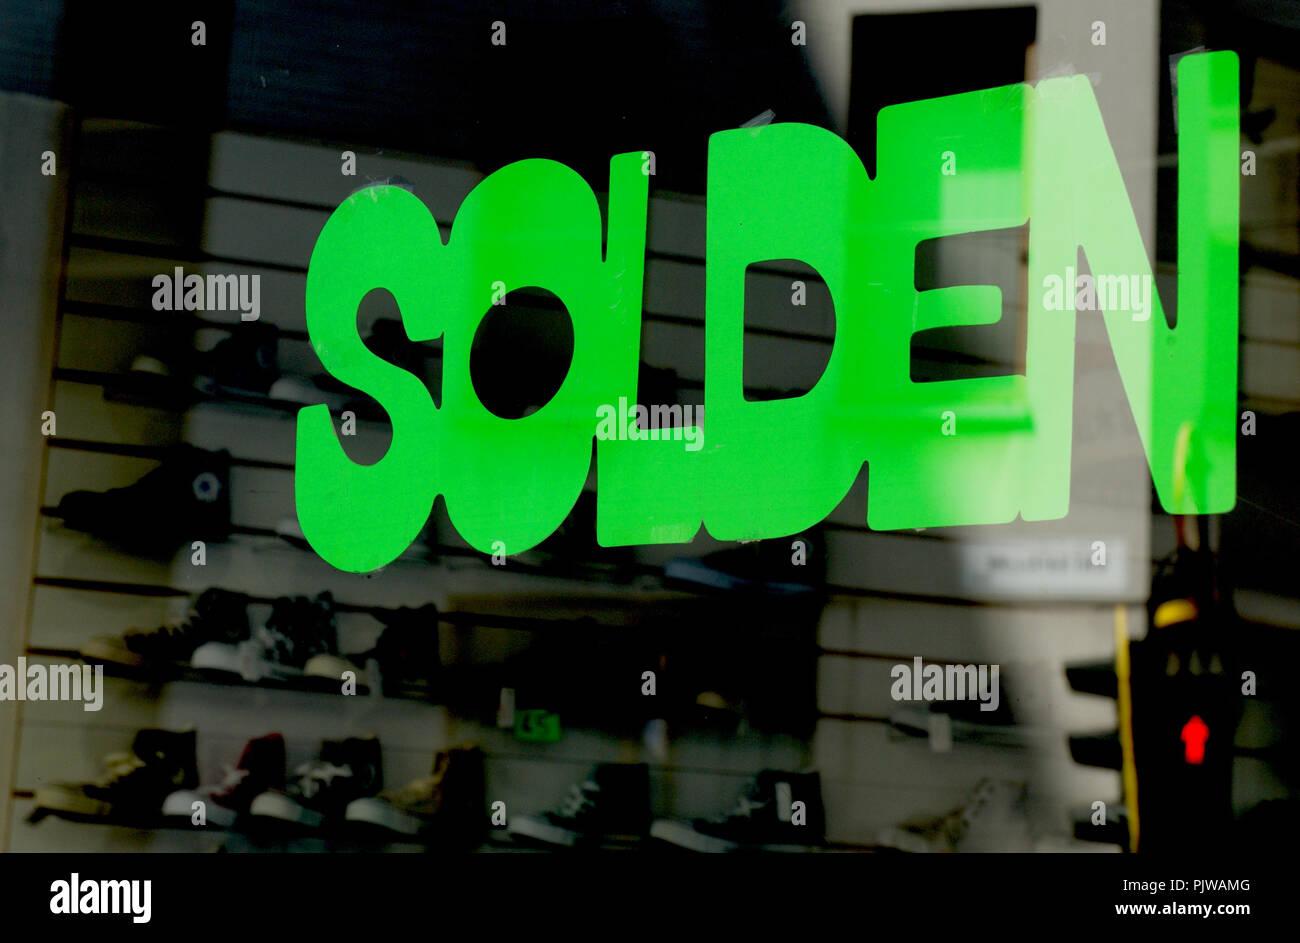 A summer Sales sign on a shop window in Antwerp (Belgium, 24/07/2008) - Stock Image